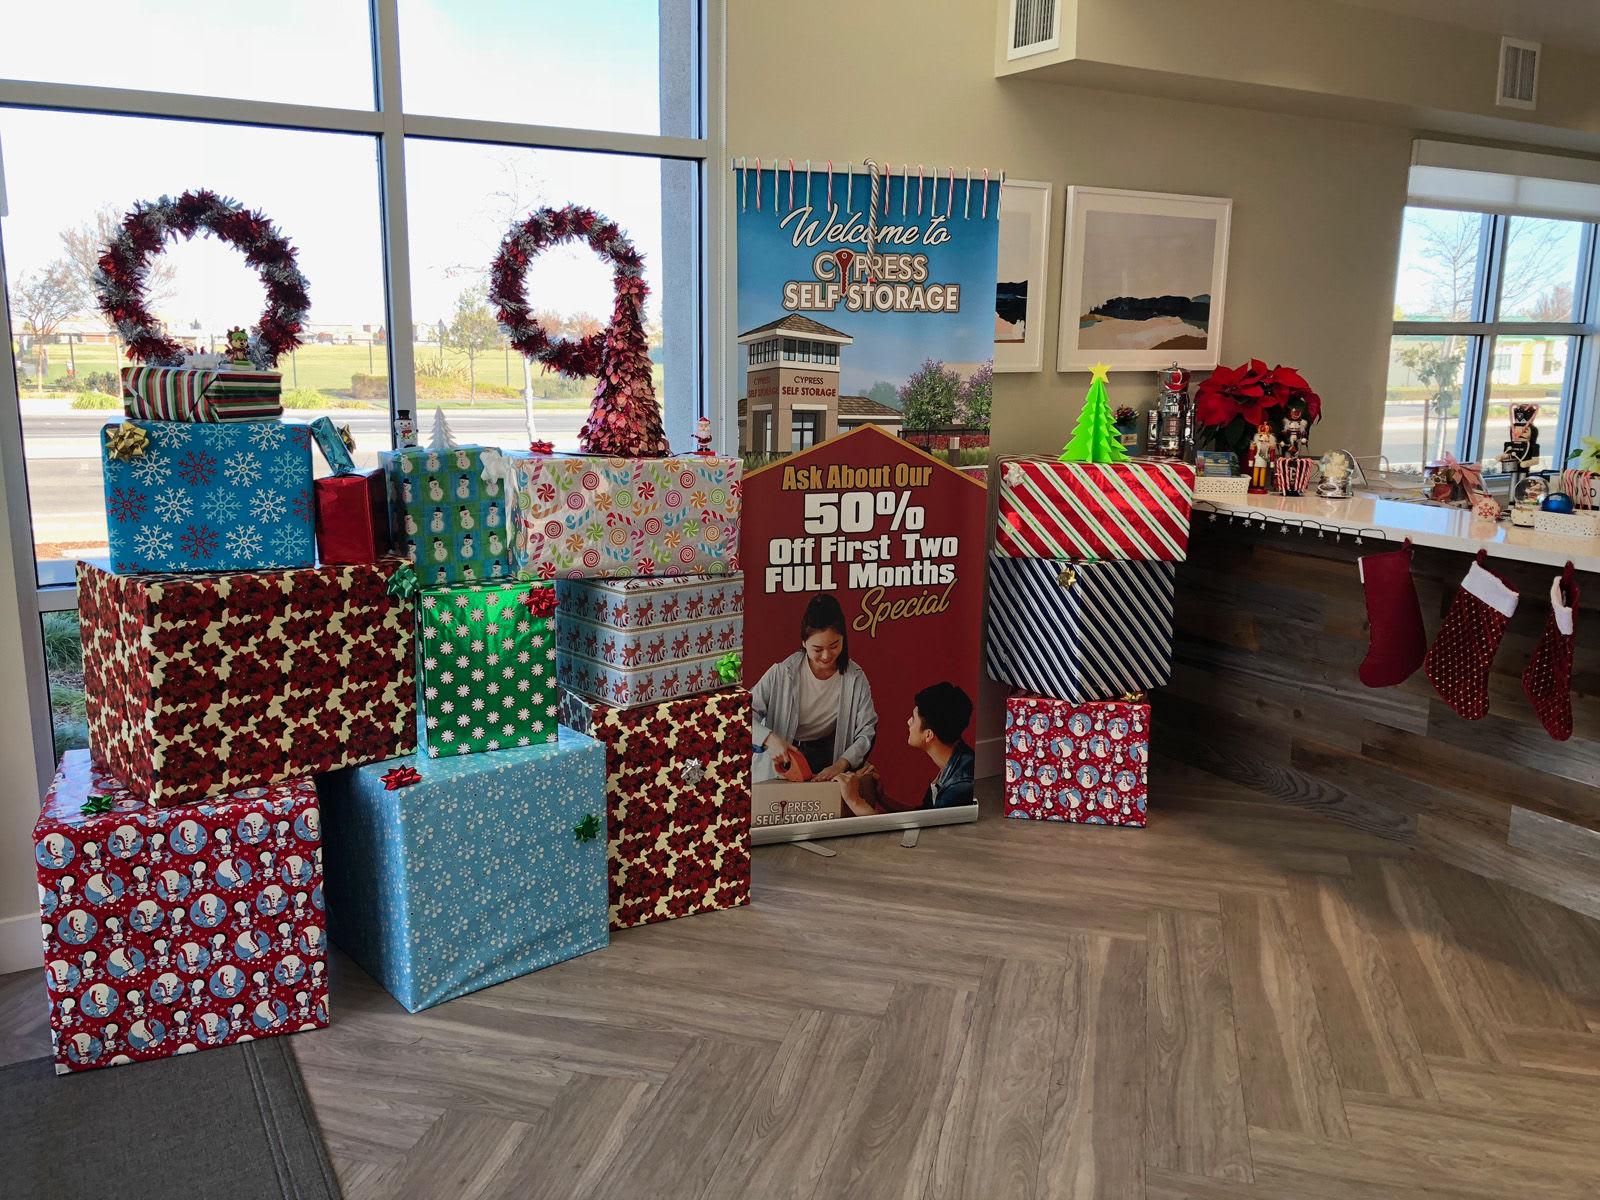 Cypress Self Storage Happy Holidays